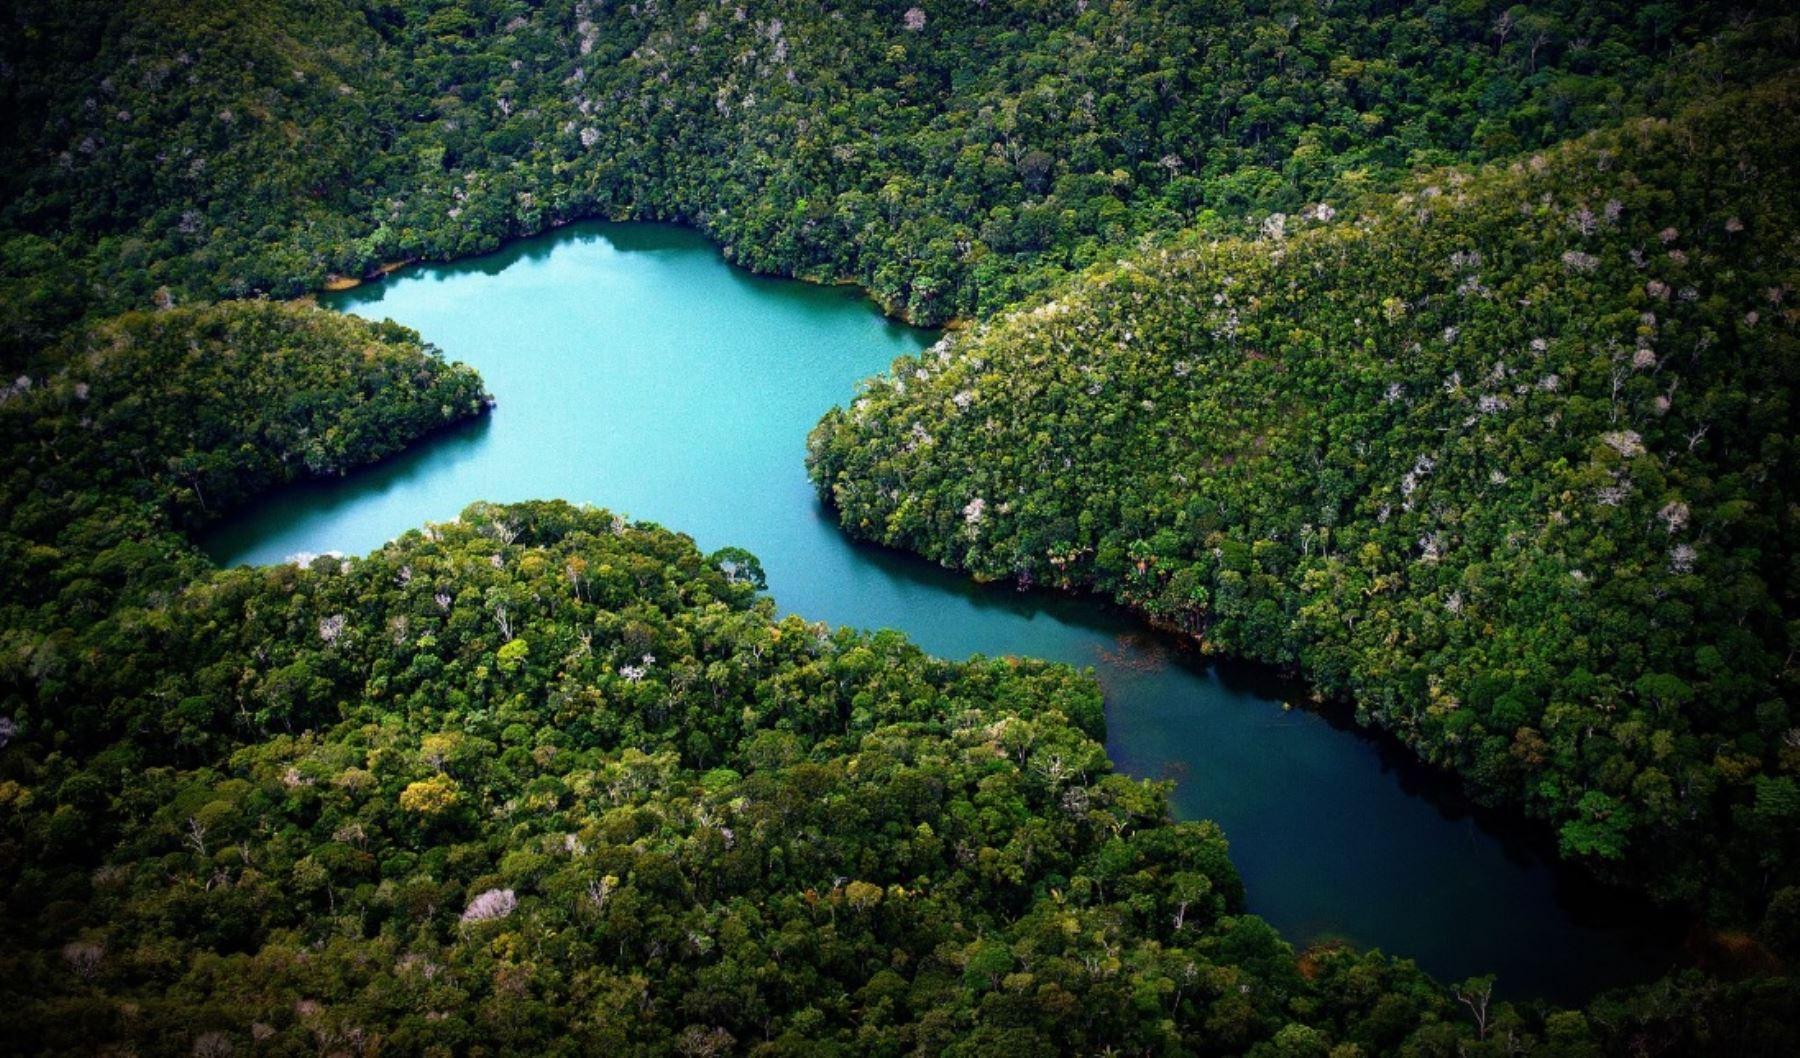 Cocha o laguna en el Parque Nacional Sierra del Divisor. Foto: Facebook/Parque Nacional Sierra del Divisor.